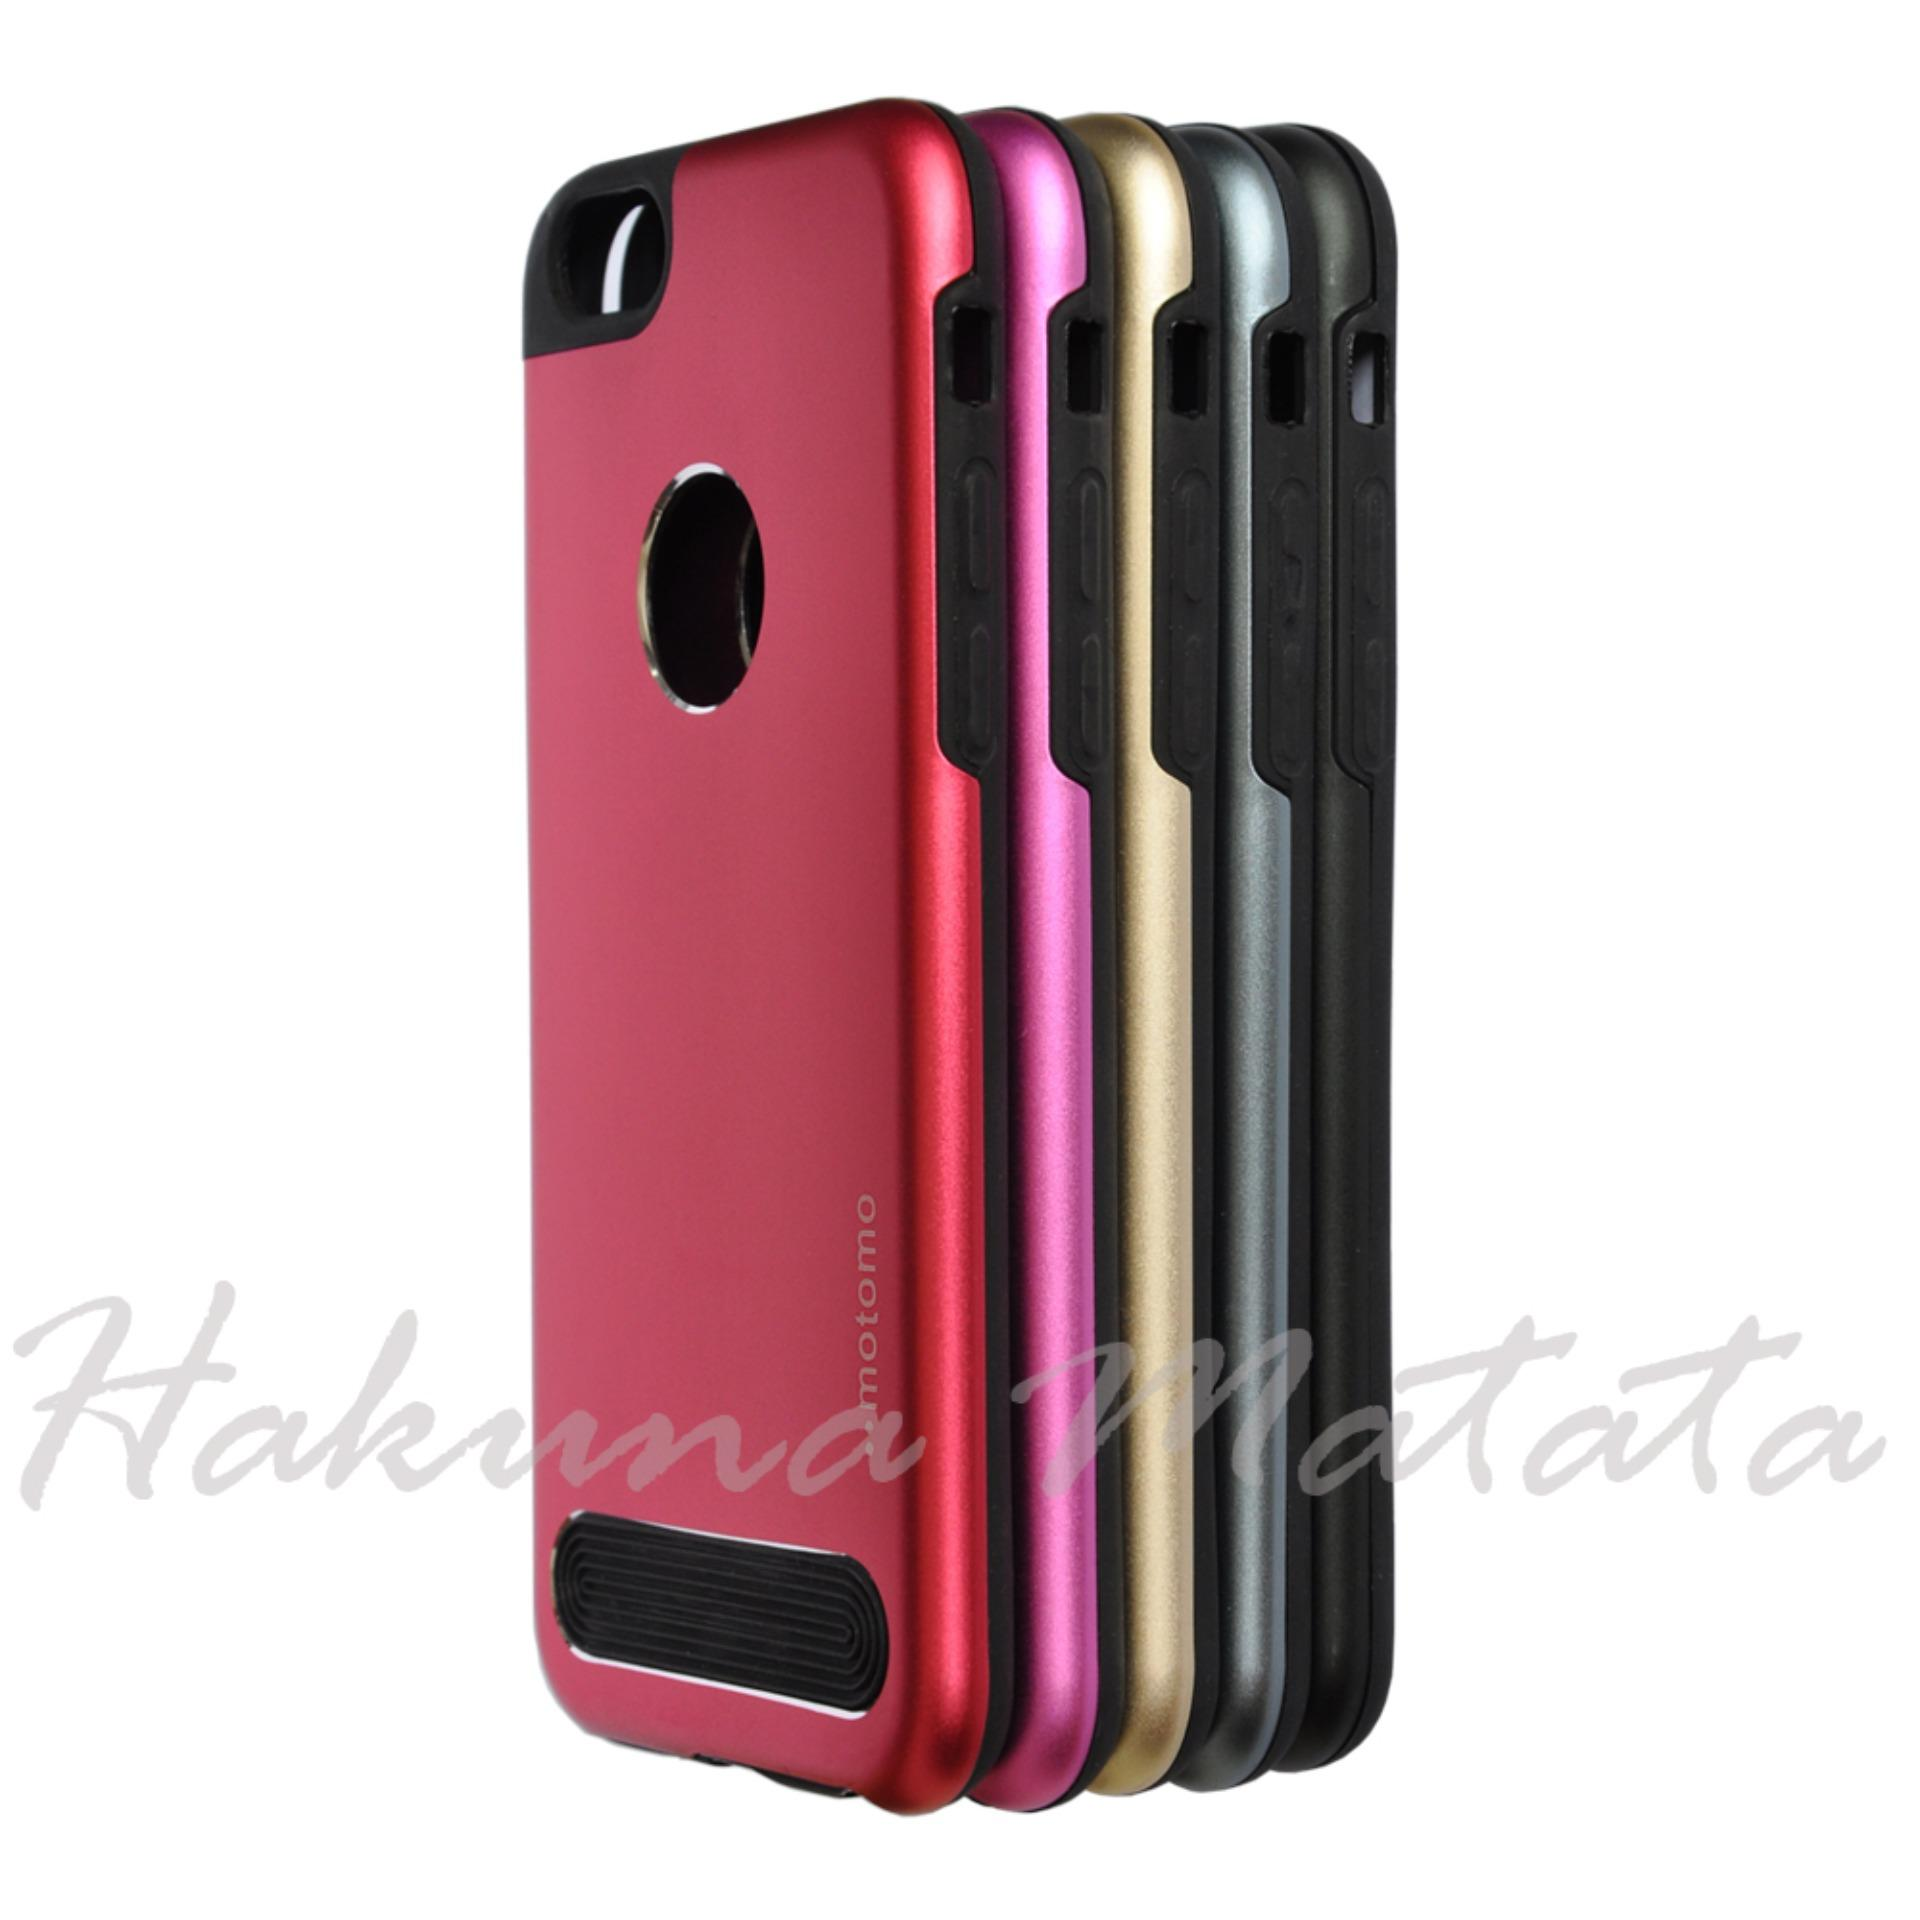 Casing Motomo Case TPU Metal Double Layers Apple iPhone 6 / 6s .